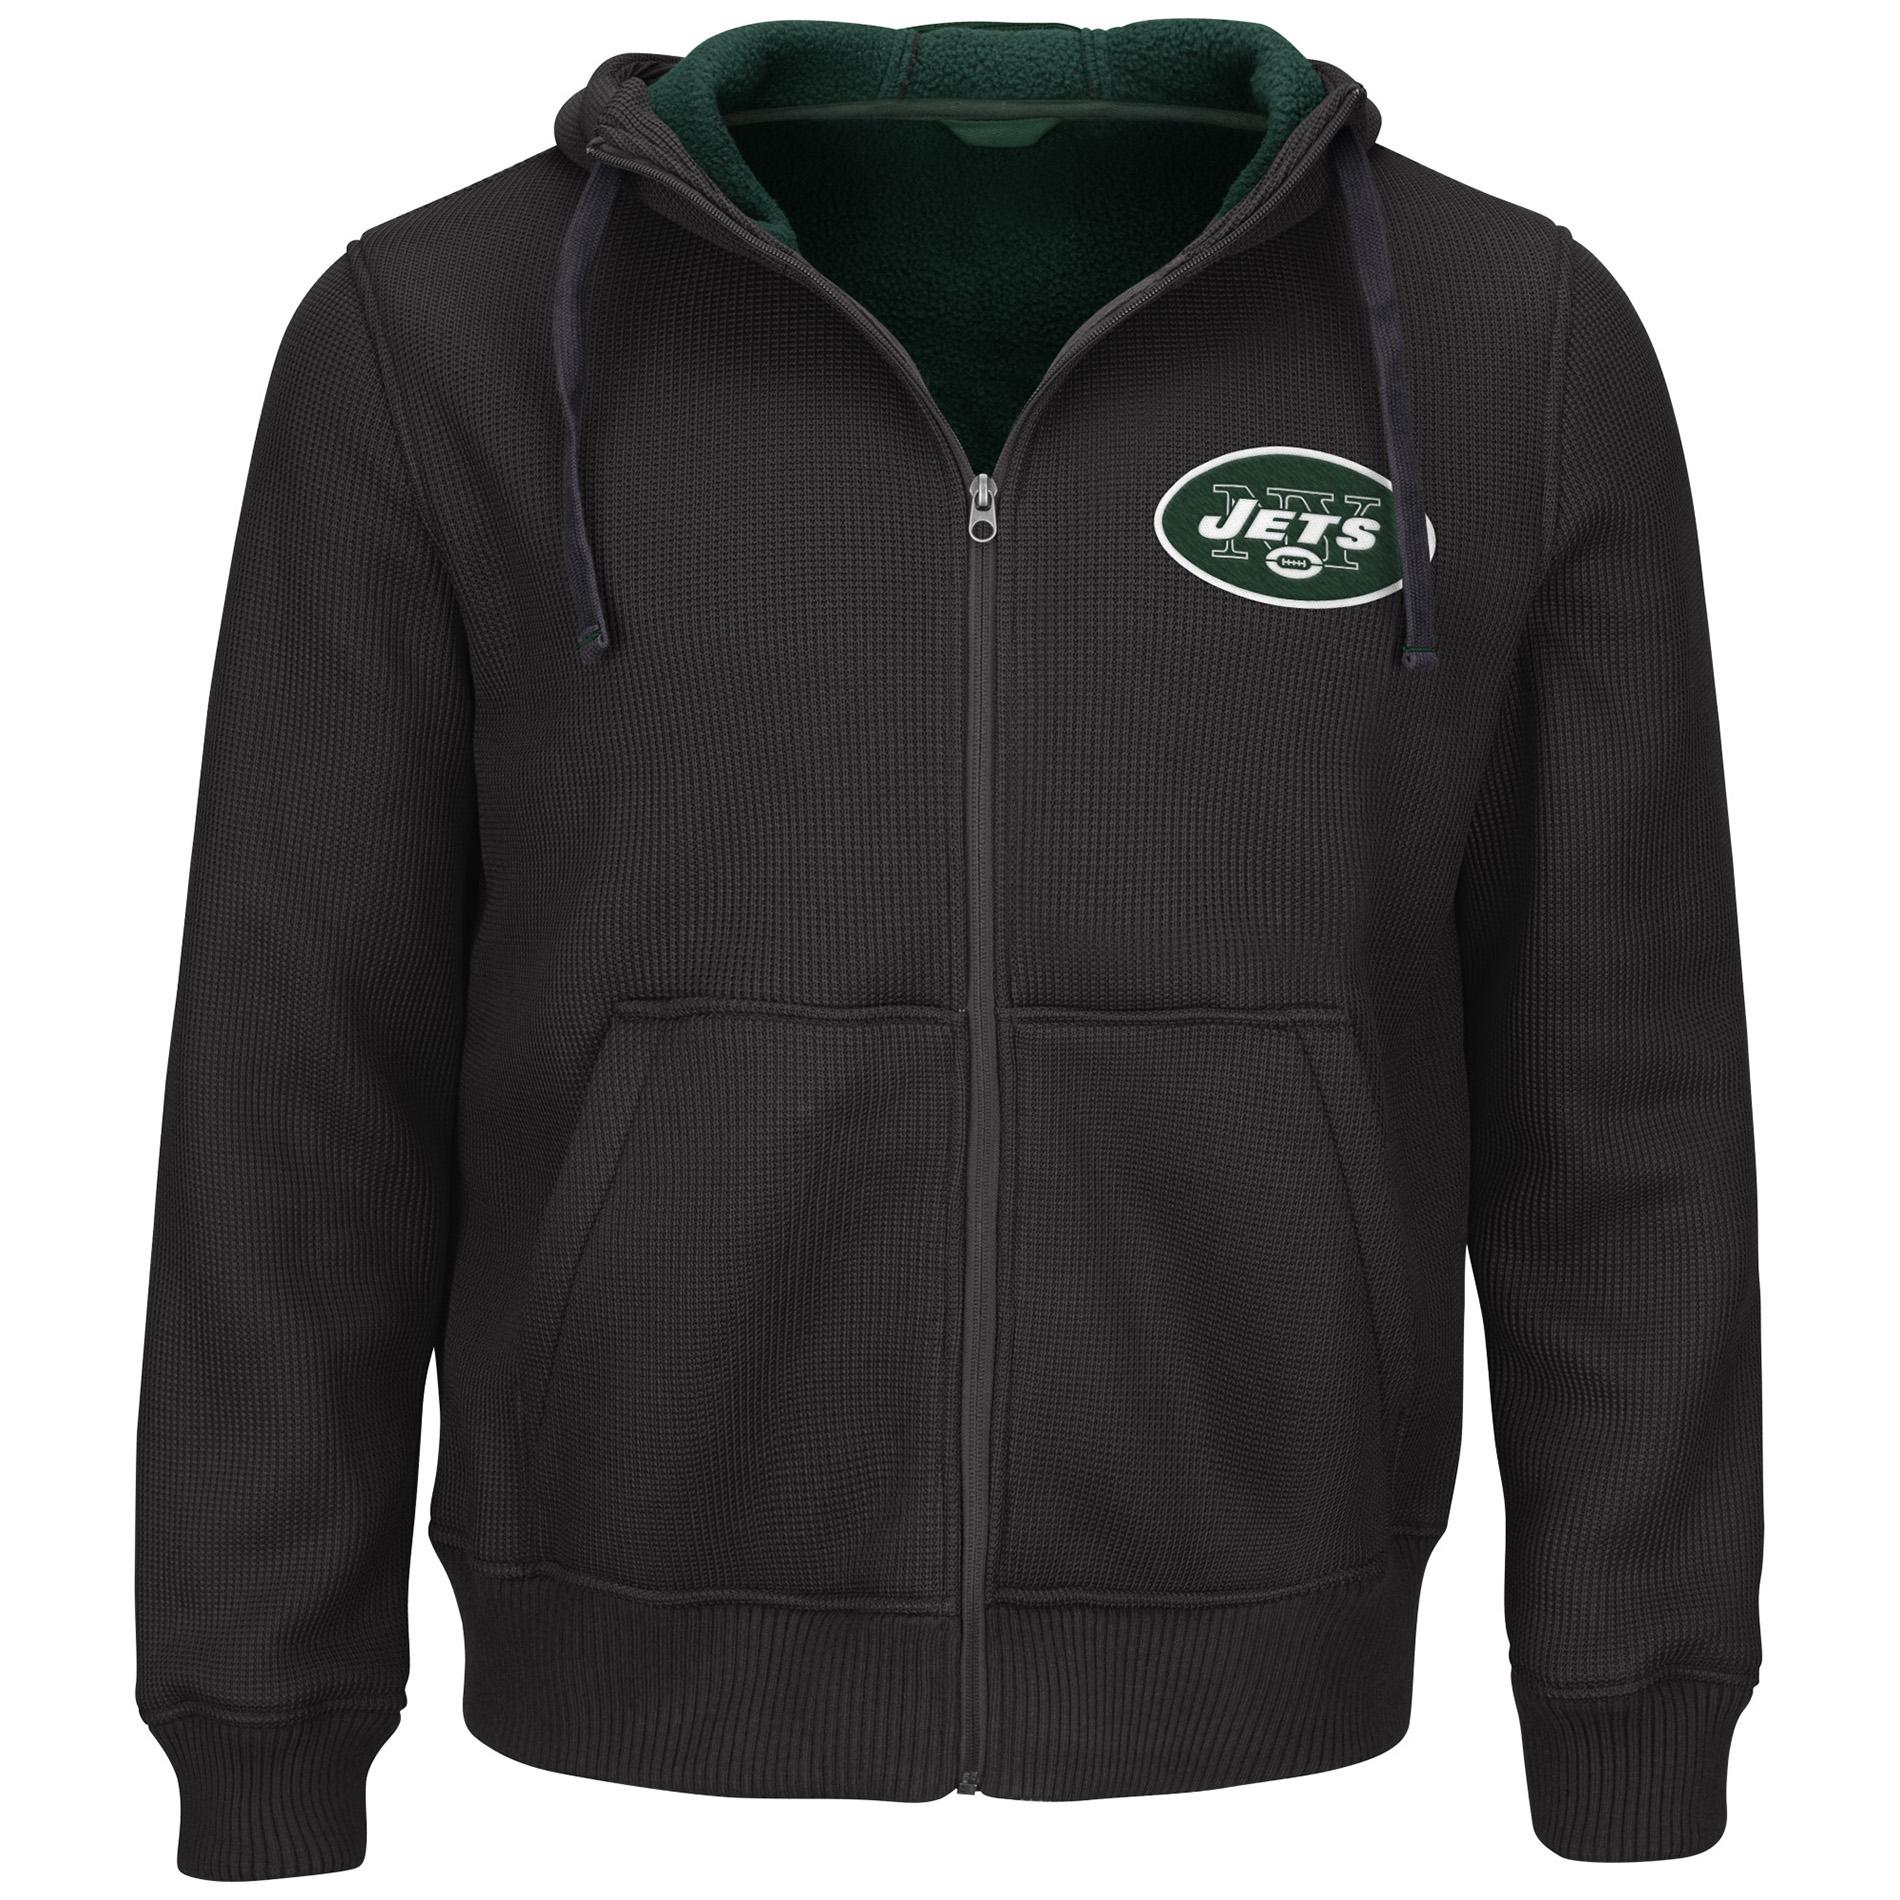 NFL Men's Graphic Hoodie - New York Jets PartNumber: A011167994 MfgPartNumber: LA700476